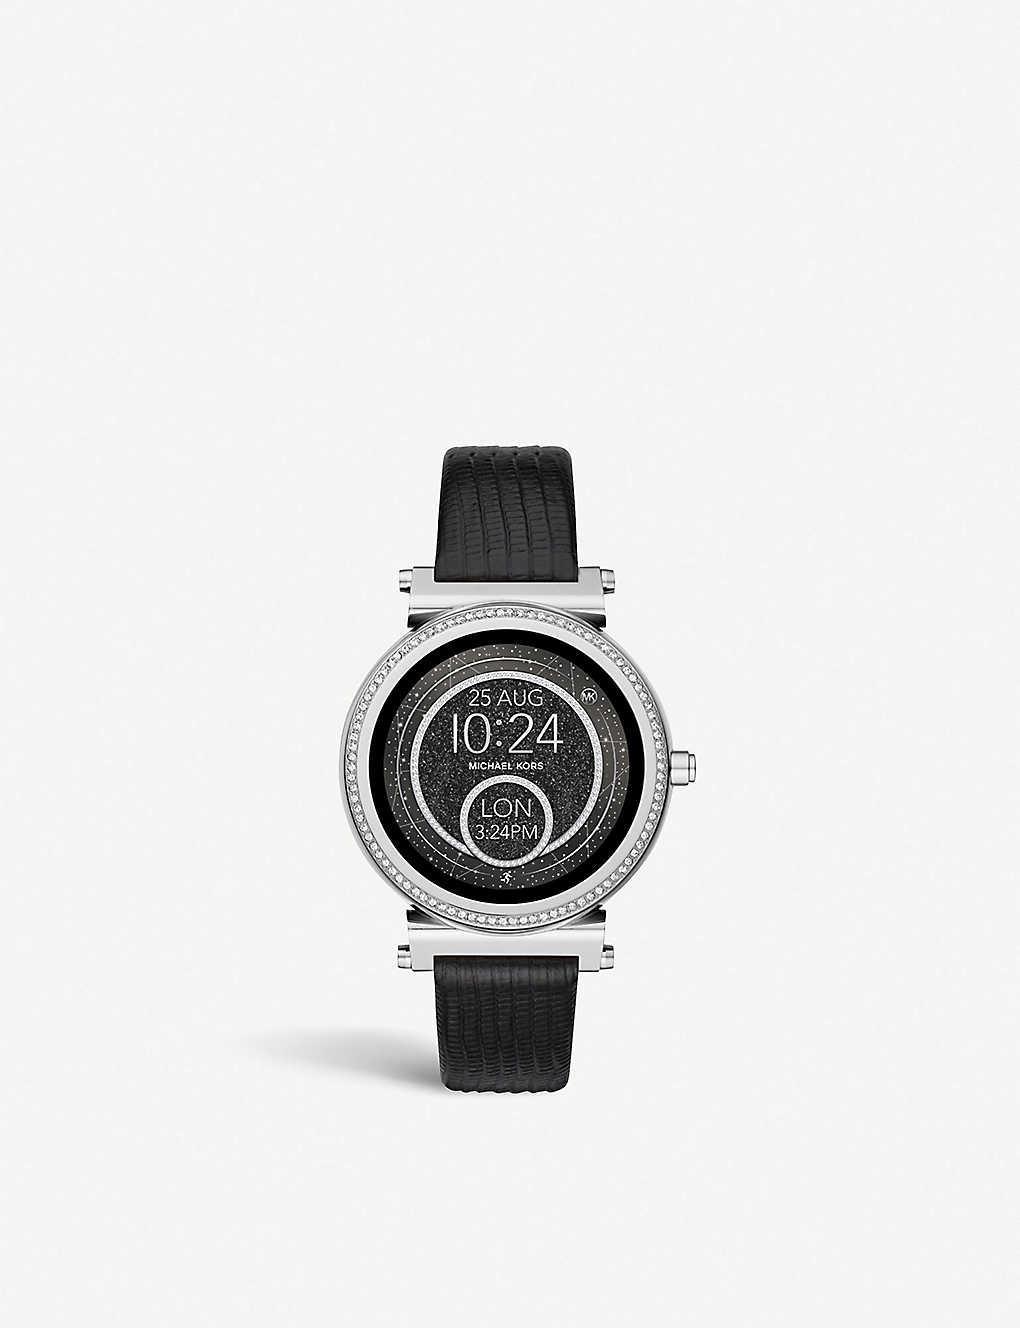 ebad78e31fcf MICHAEL KORS - Sofie embossed leather Smartwatch strap